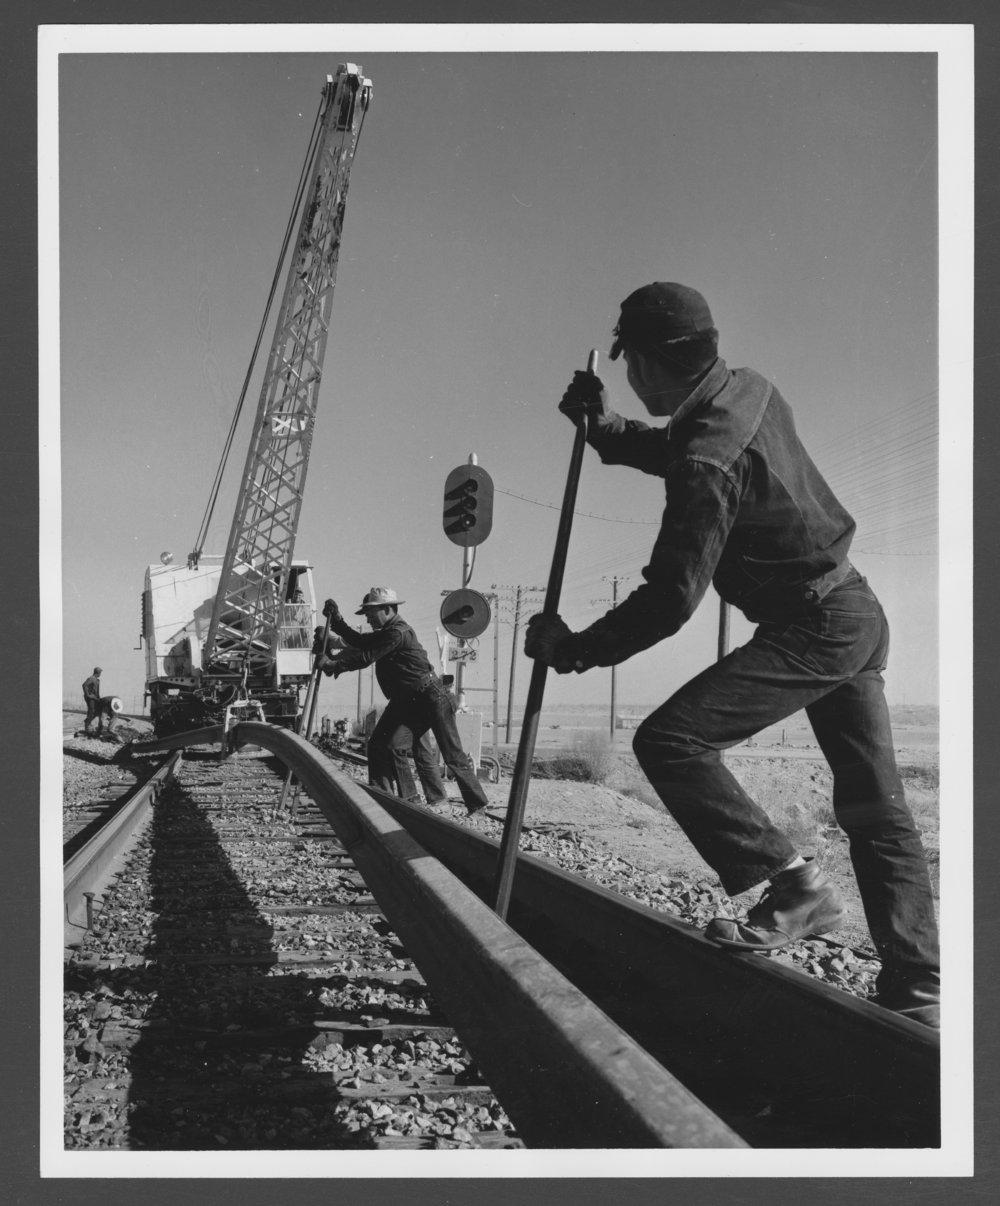 Atchison, Topeka & Santa Fe Railway Company employees - 1